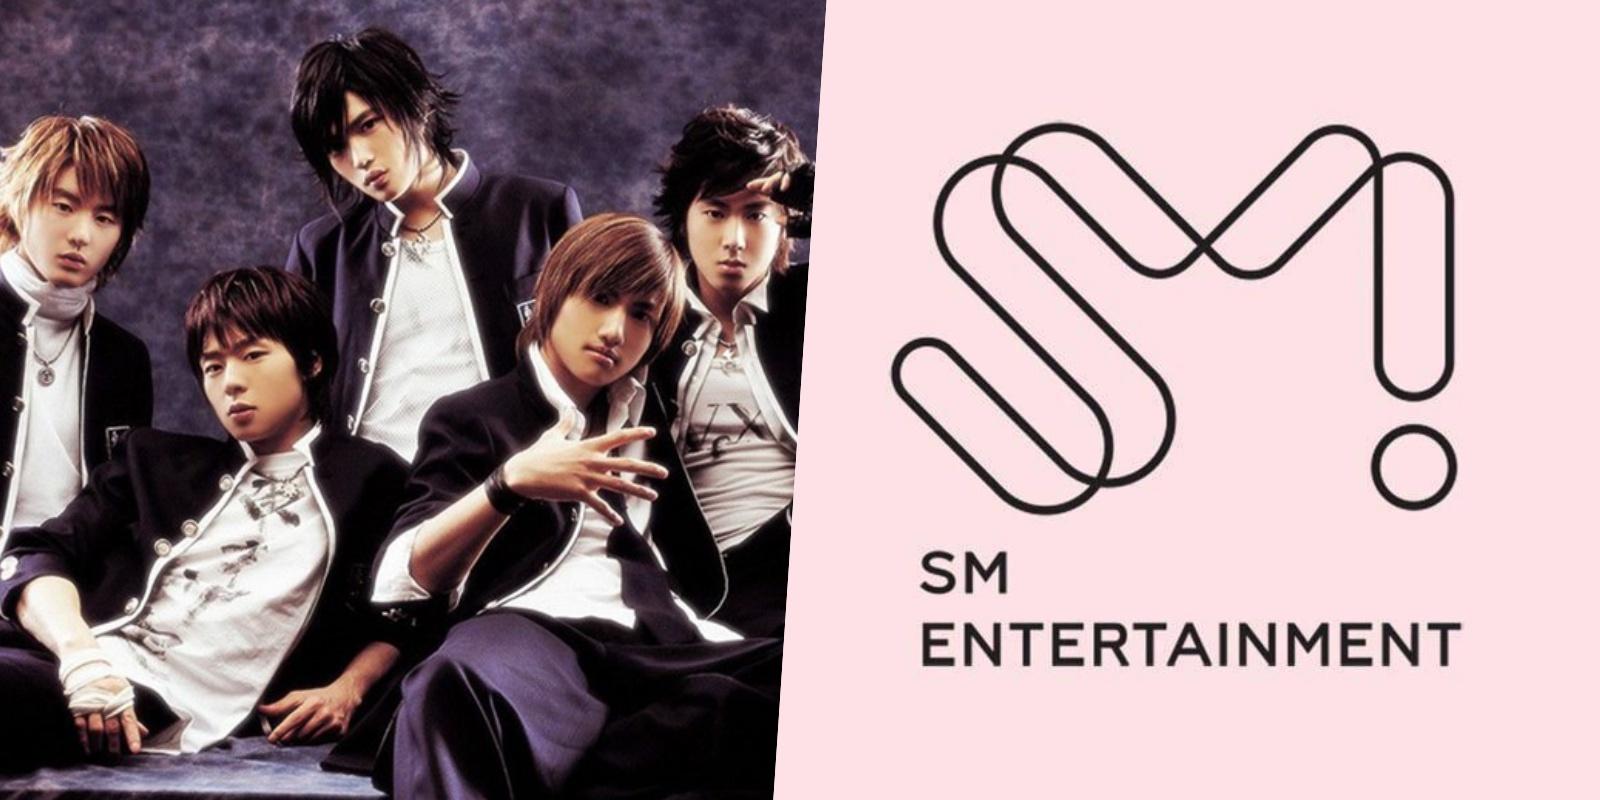 tvxq sm entertainment